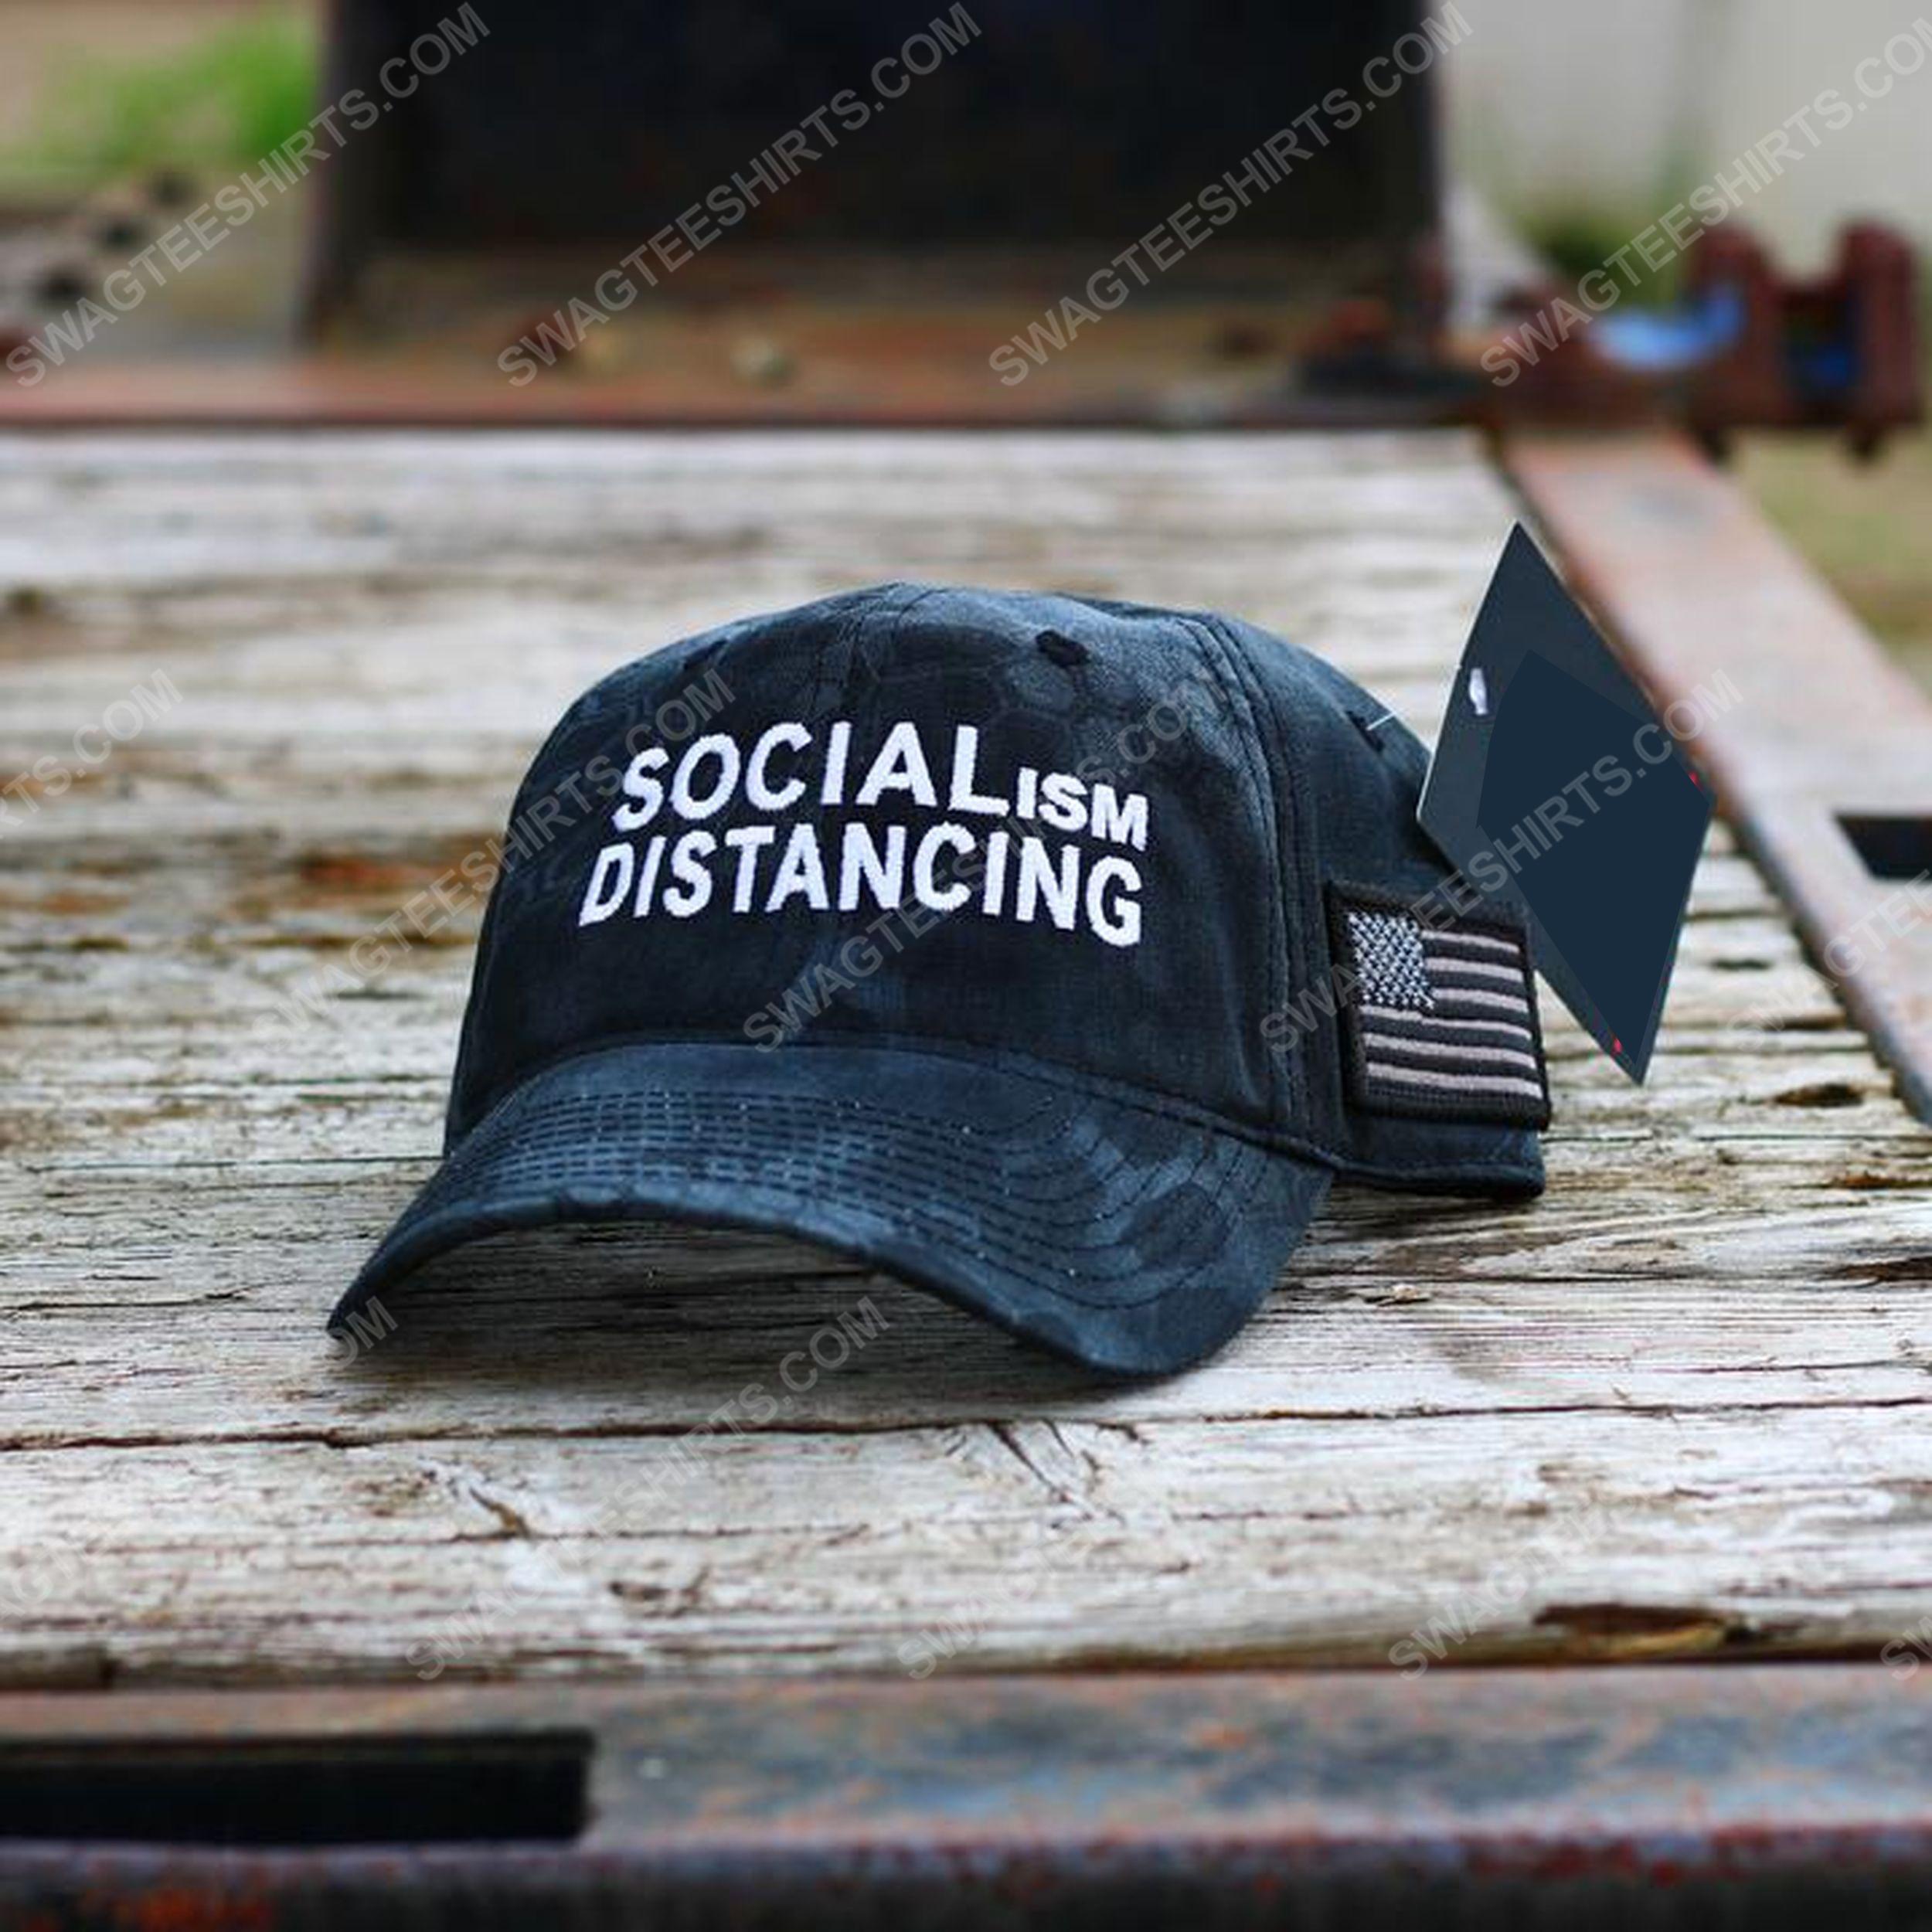 Socialism distancing full print classic hat 1 - Copy (3)